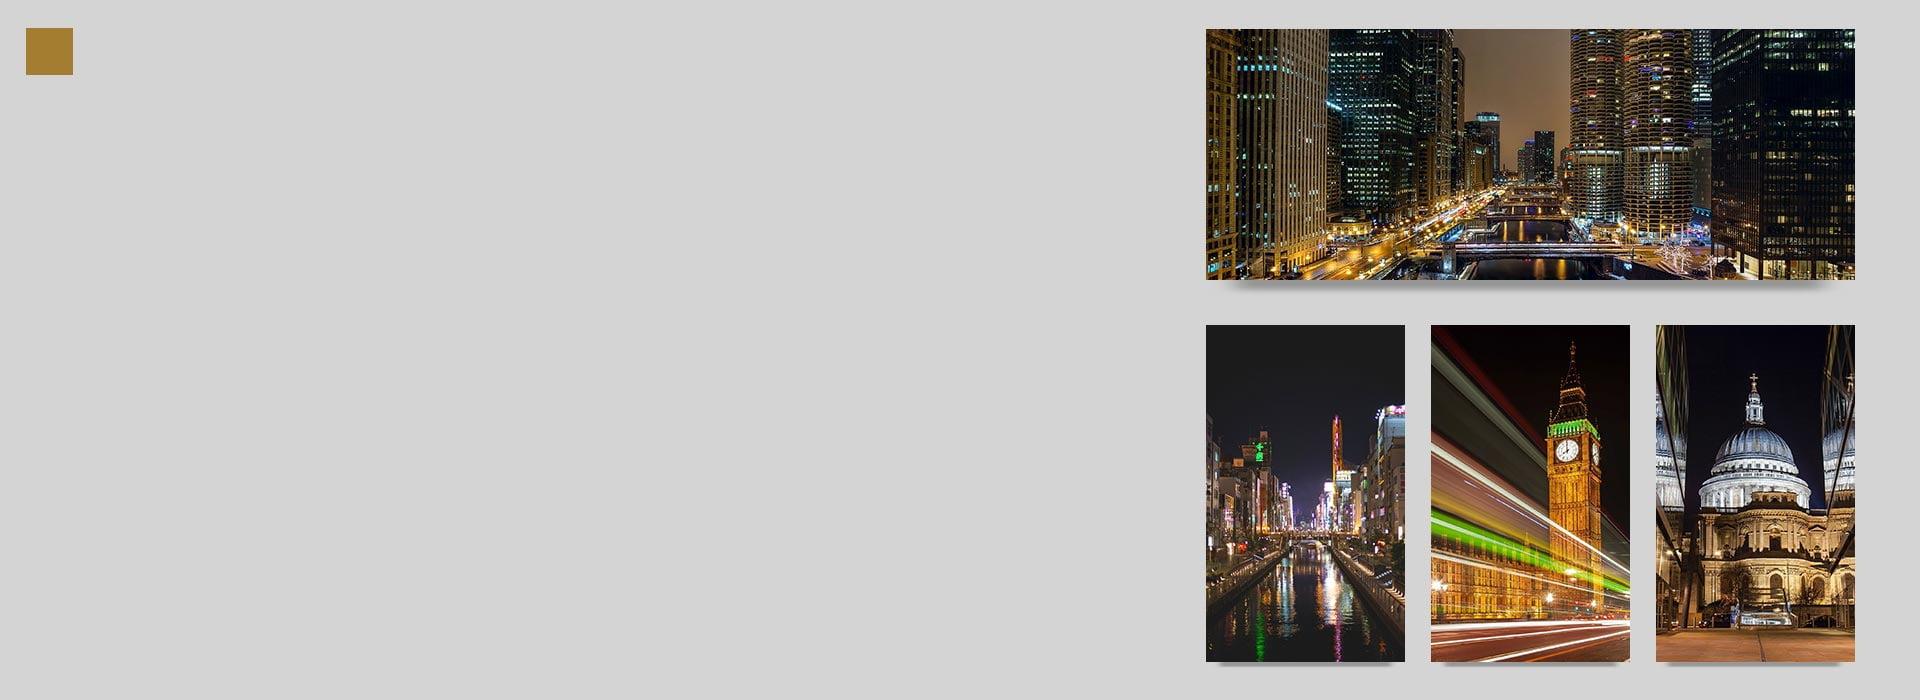 Overlooks and Vistas photography - عکاسی در شب